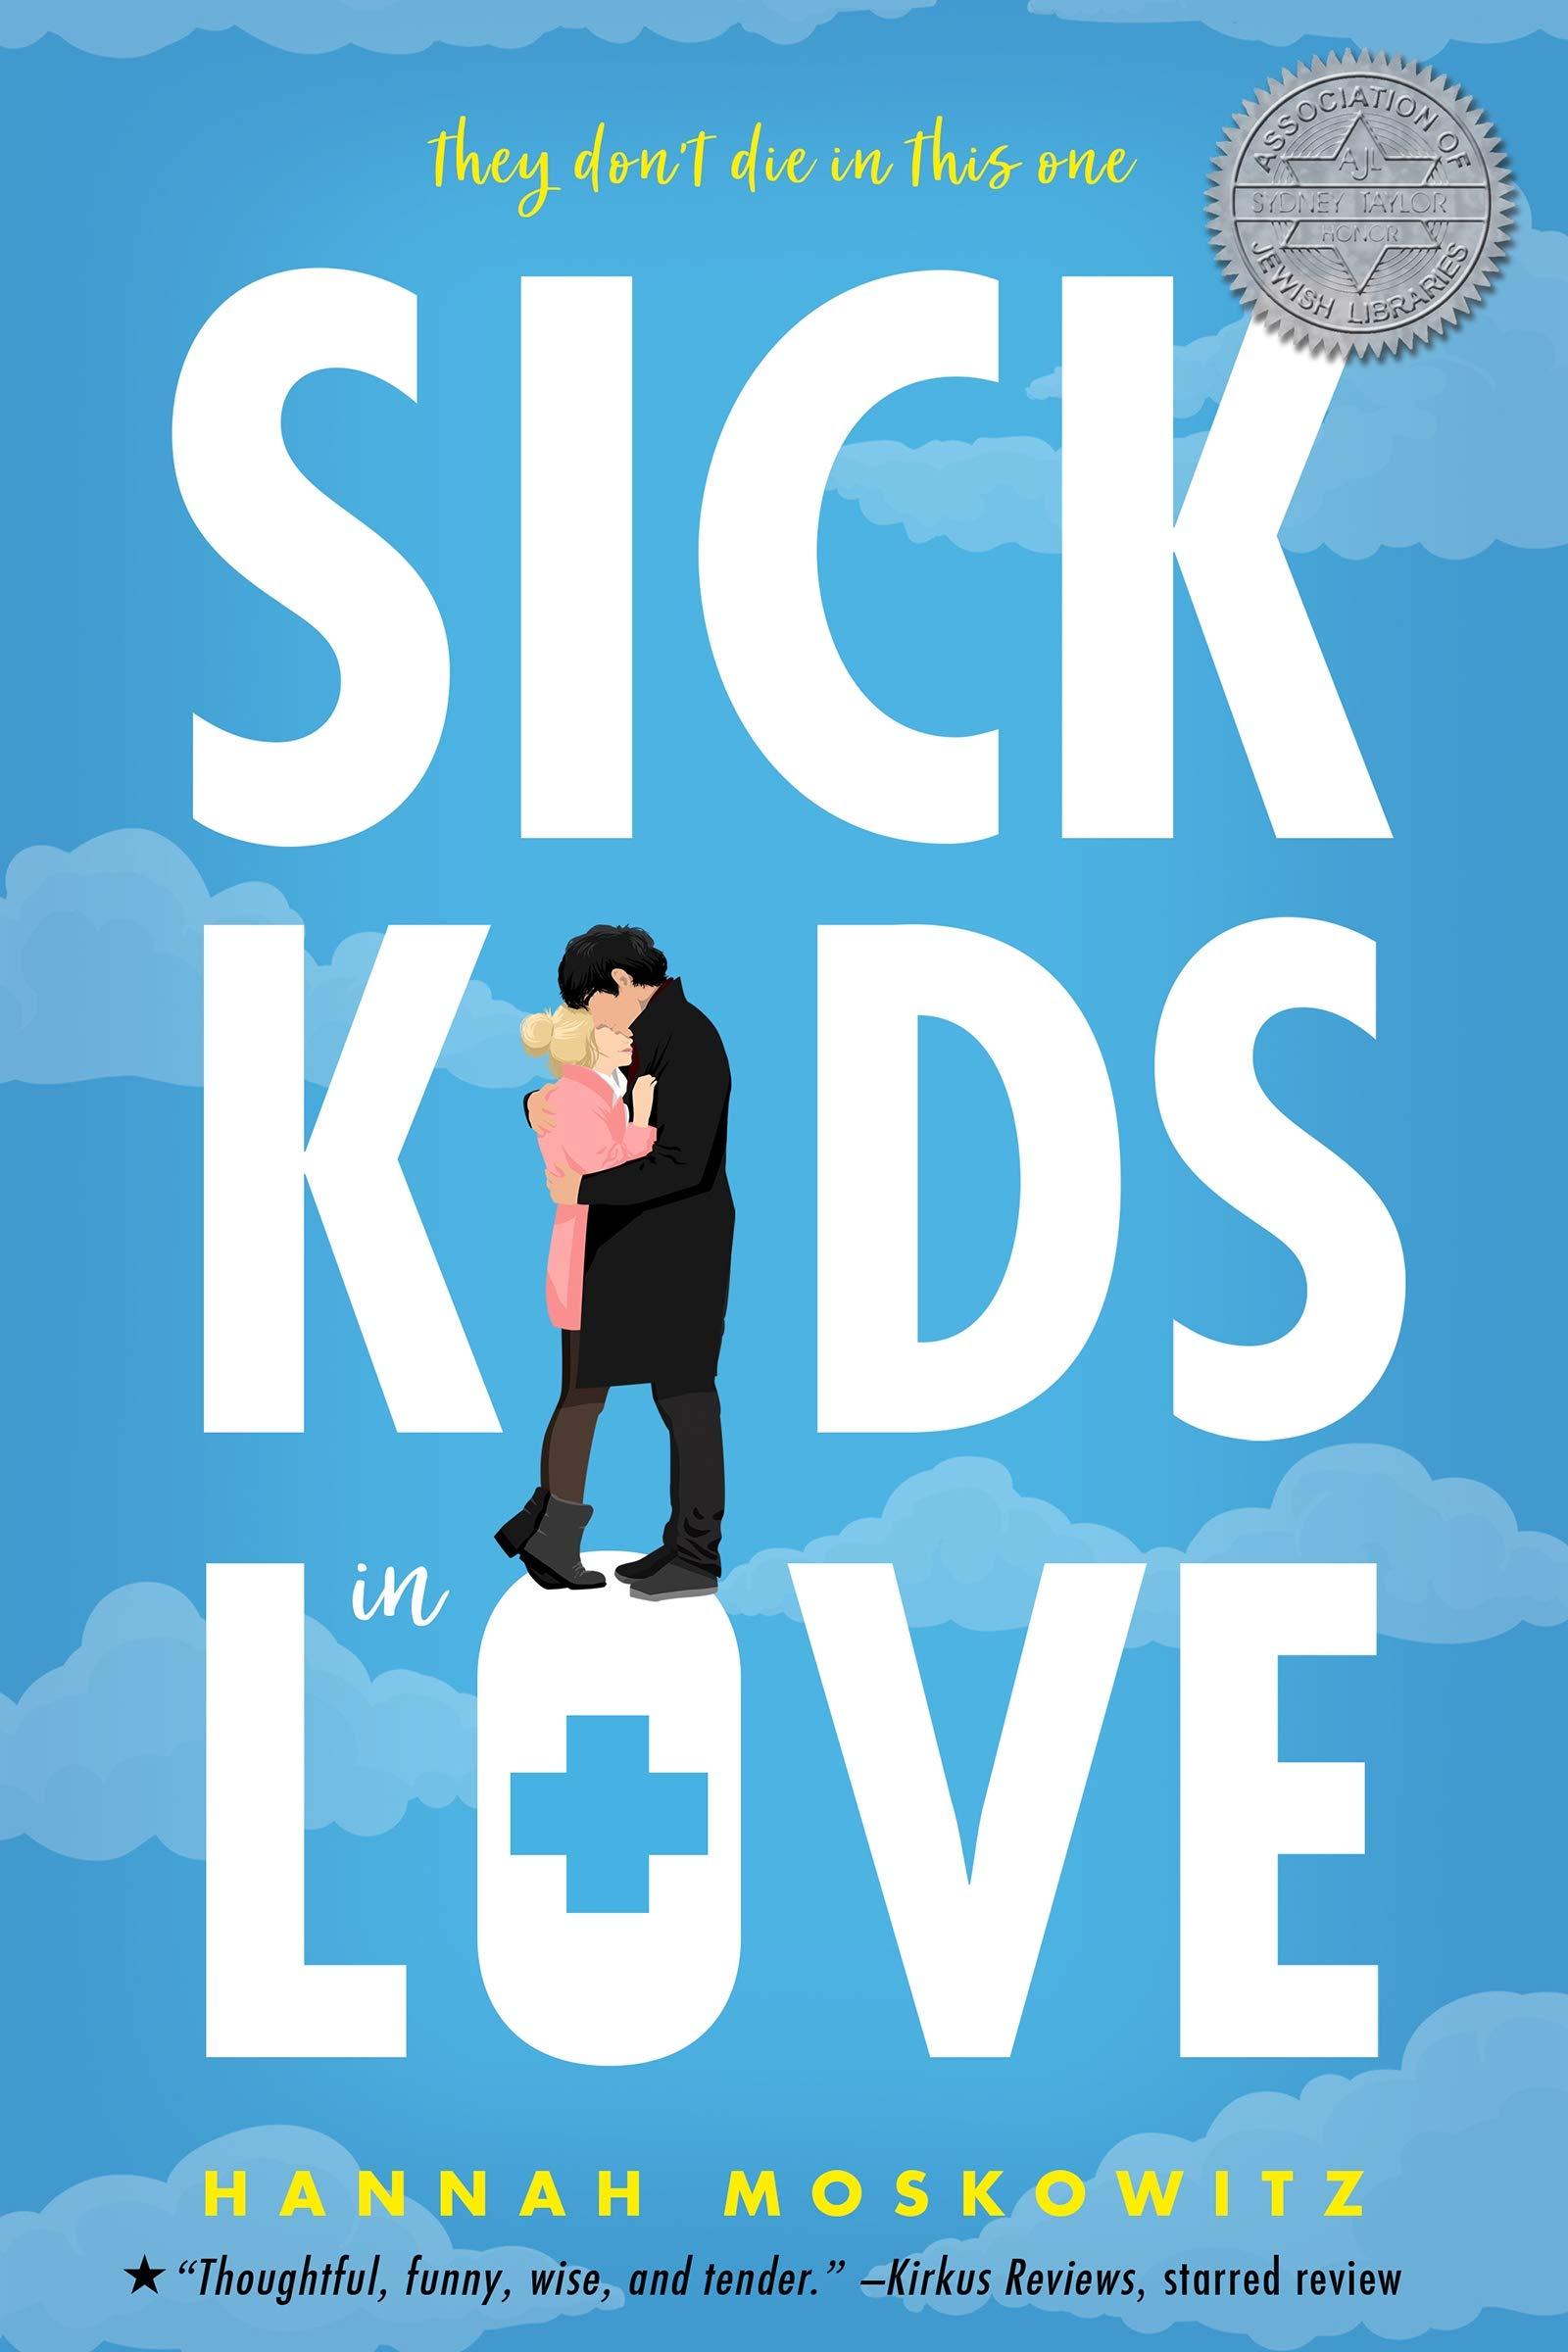 Amazon.com: Sick Kids In Love (9781640637320): Moskowitz, Hannah: Books